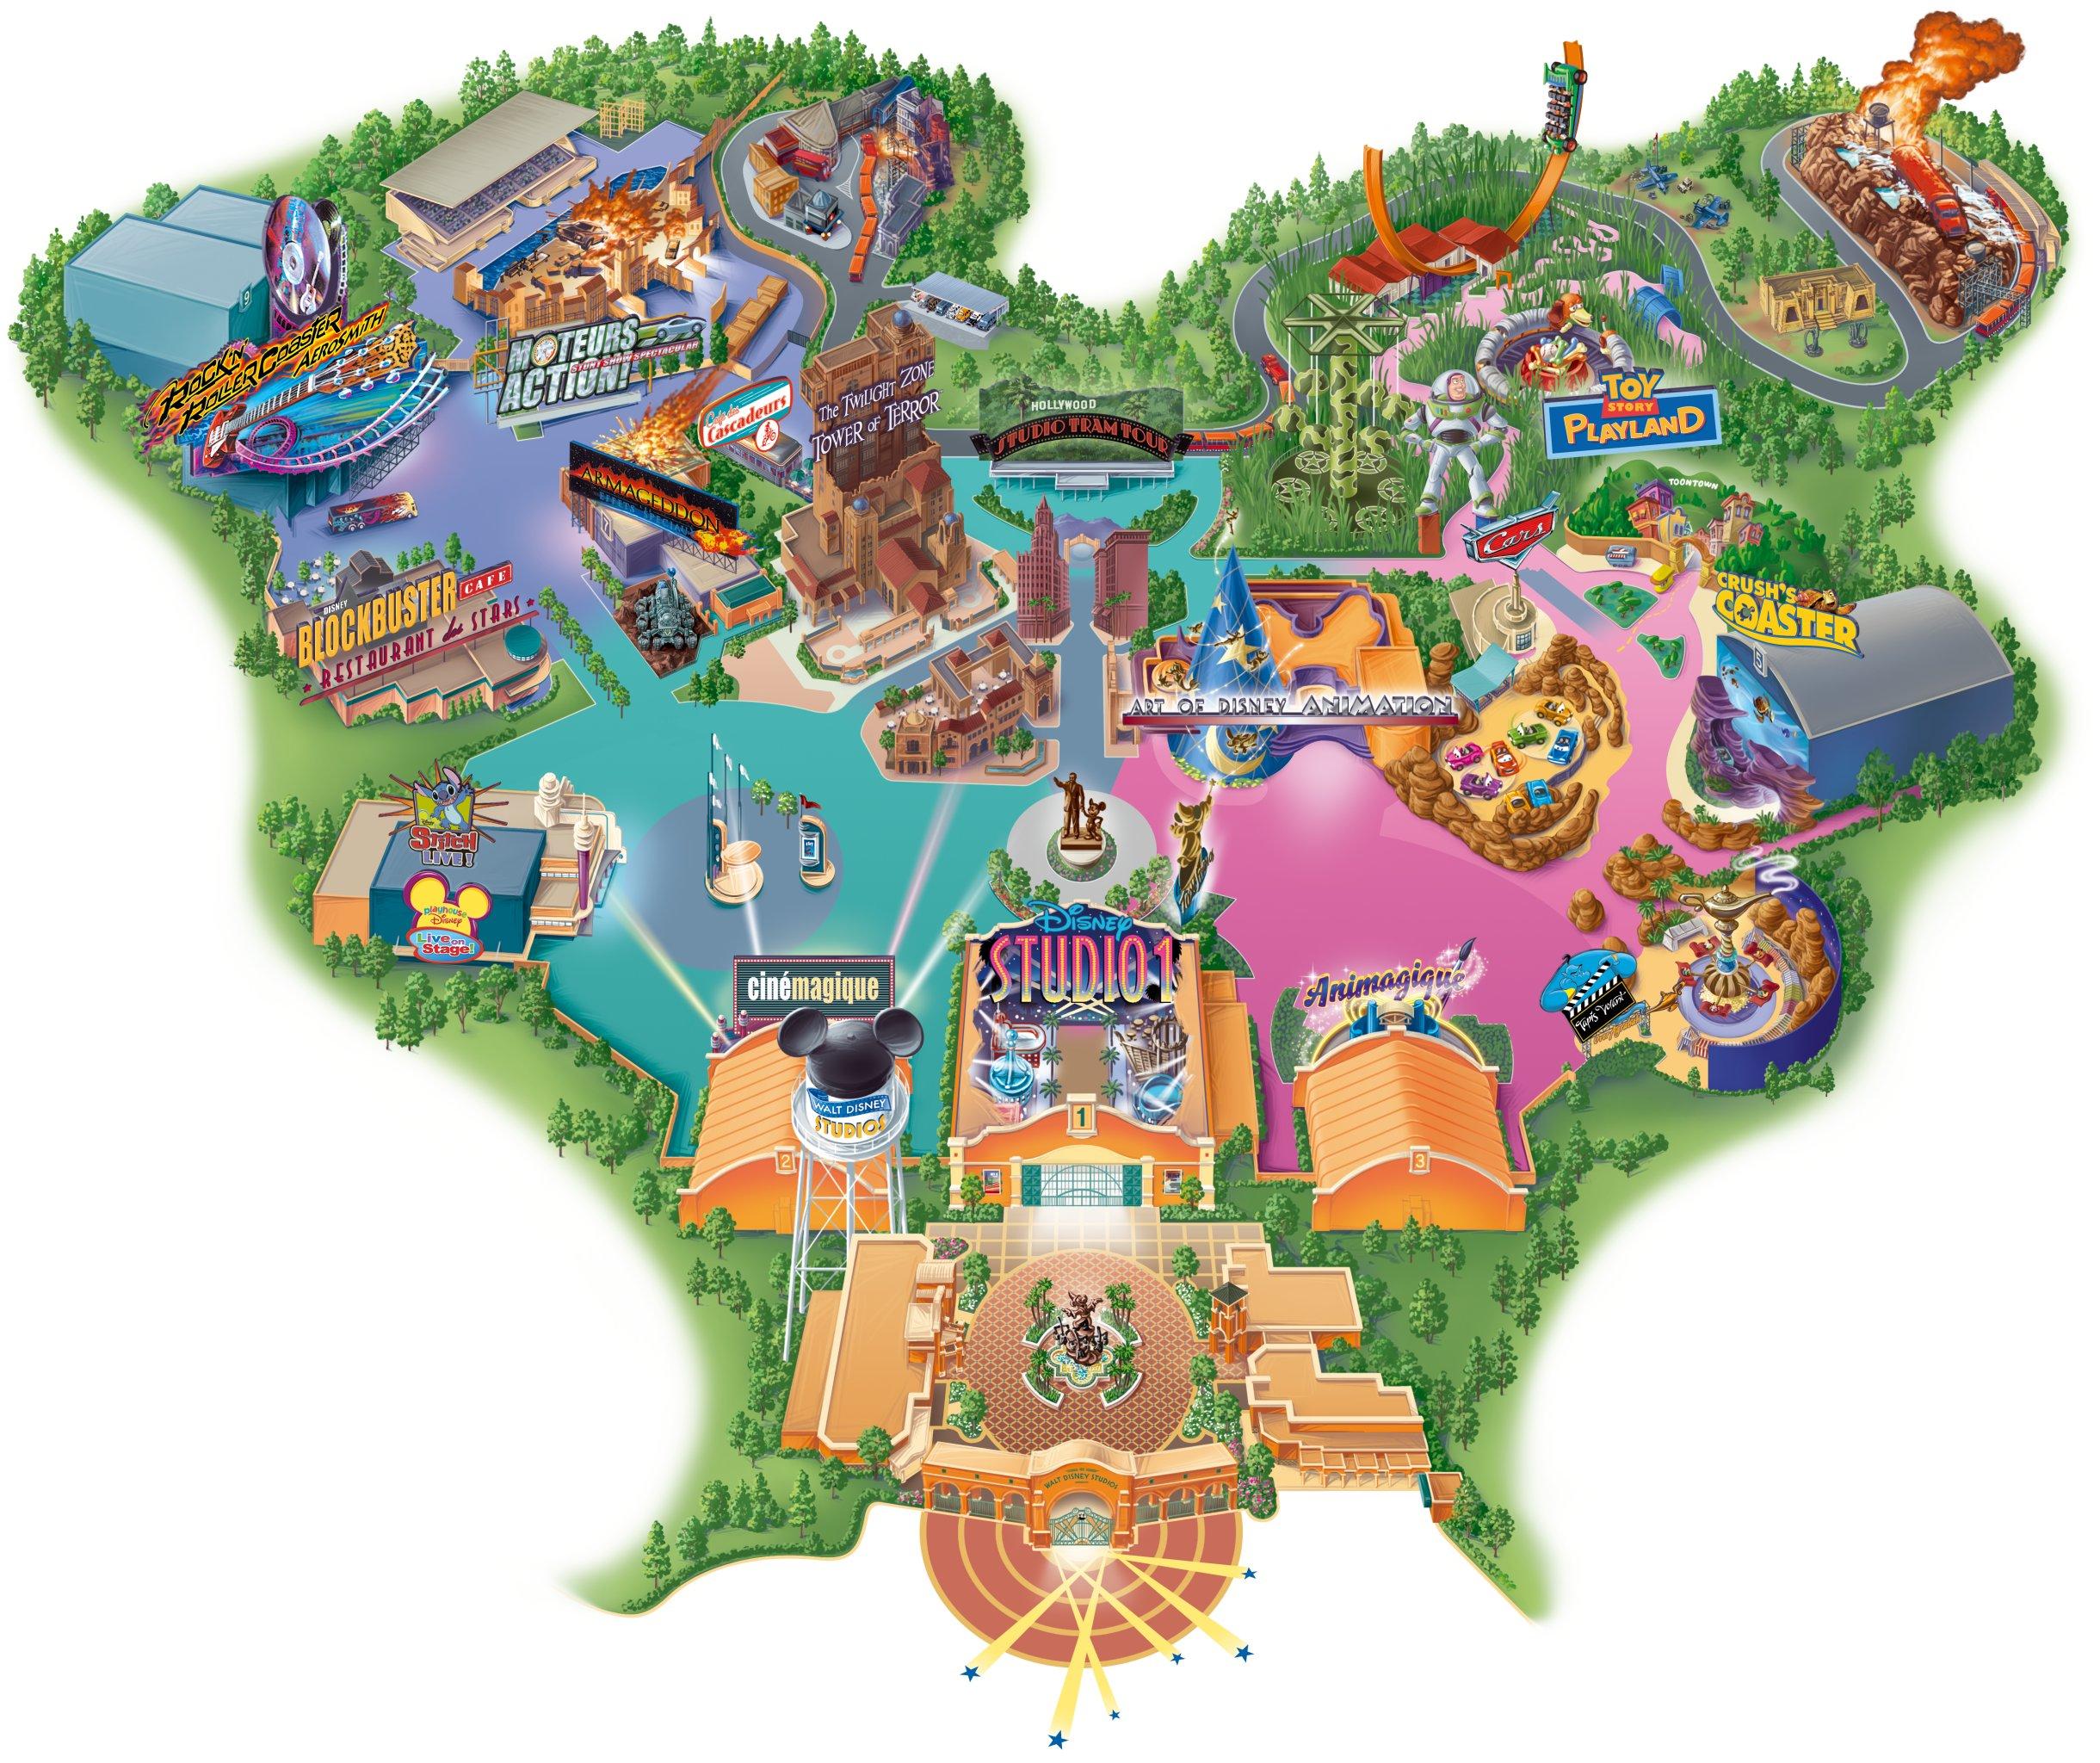 Disneyland Paris Park Map 2011.